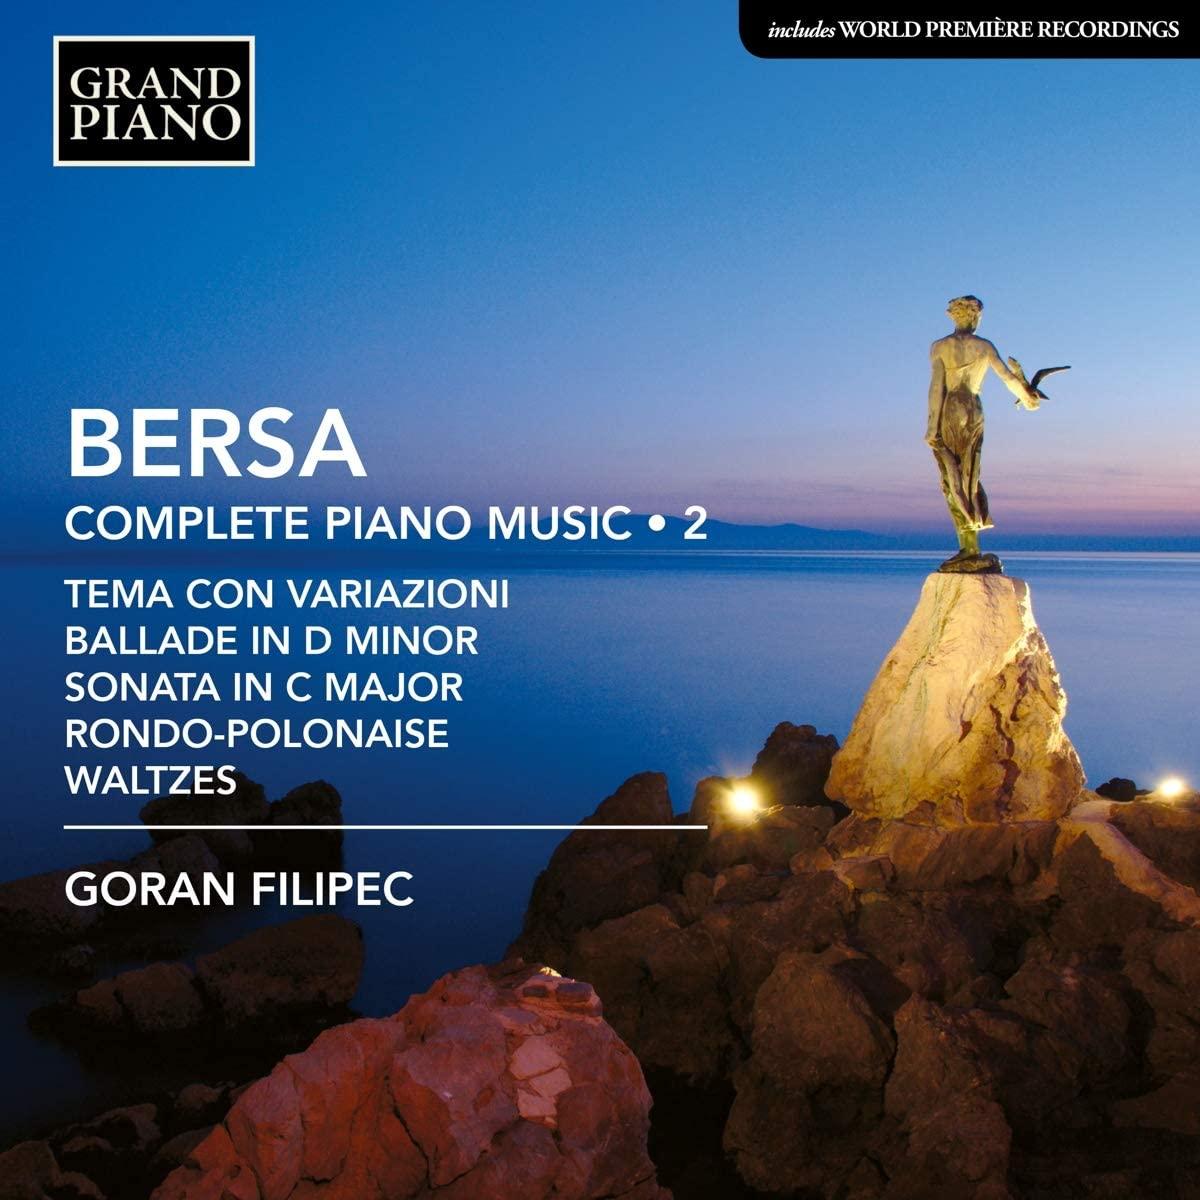 Review of BERSA Complete Piano Music, Vol 2 (Goran Filipec)